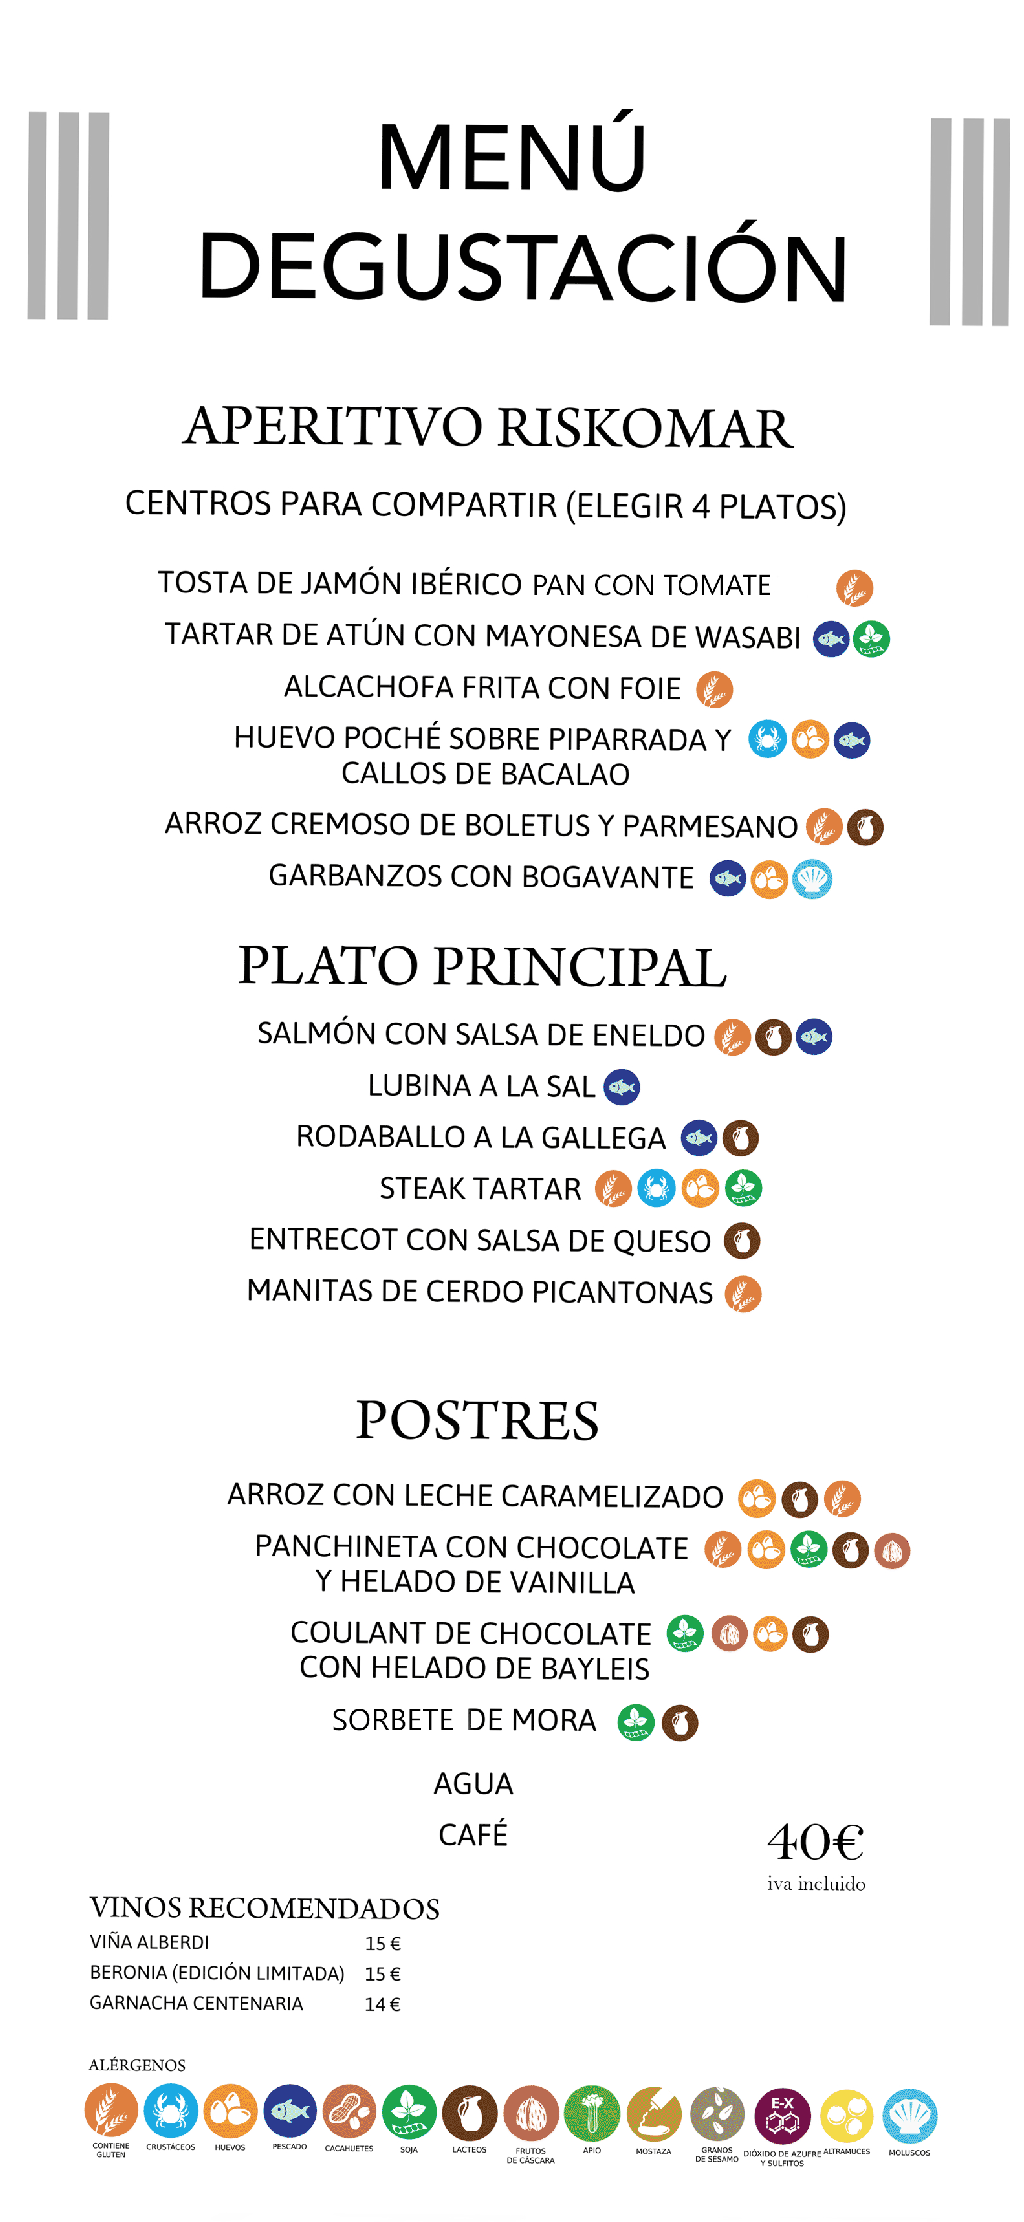 Menu degustación Zaragoza